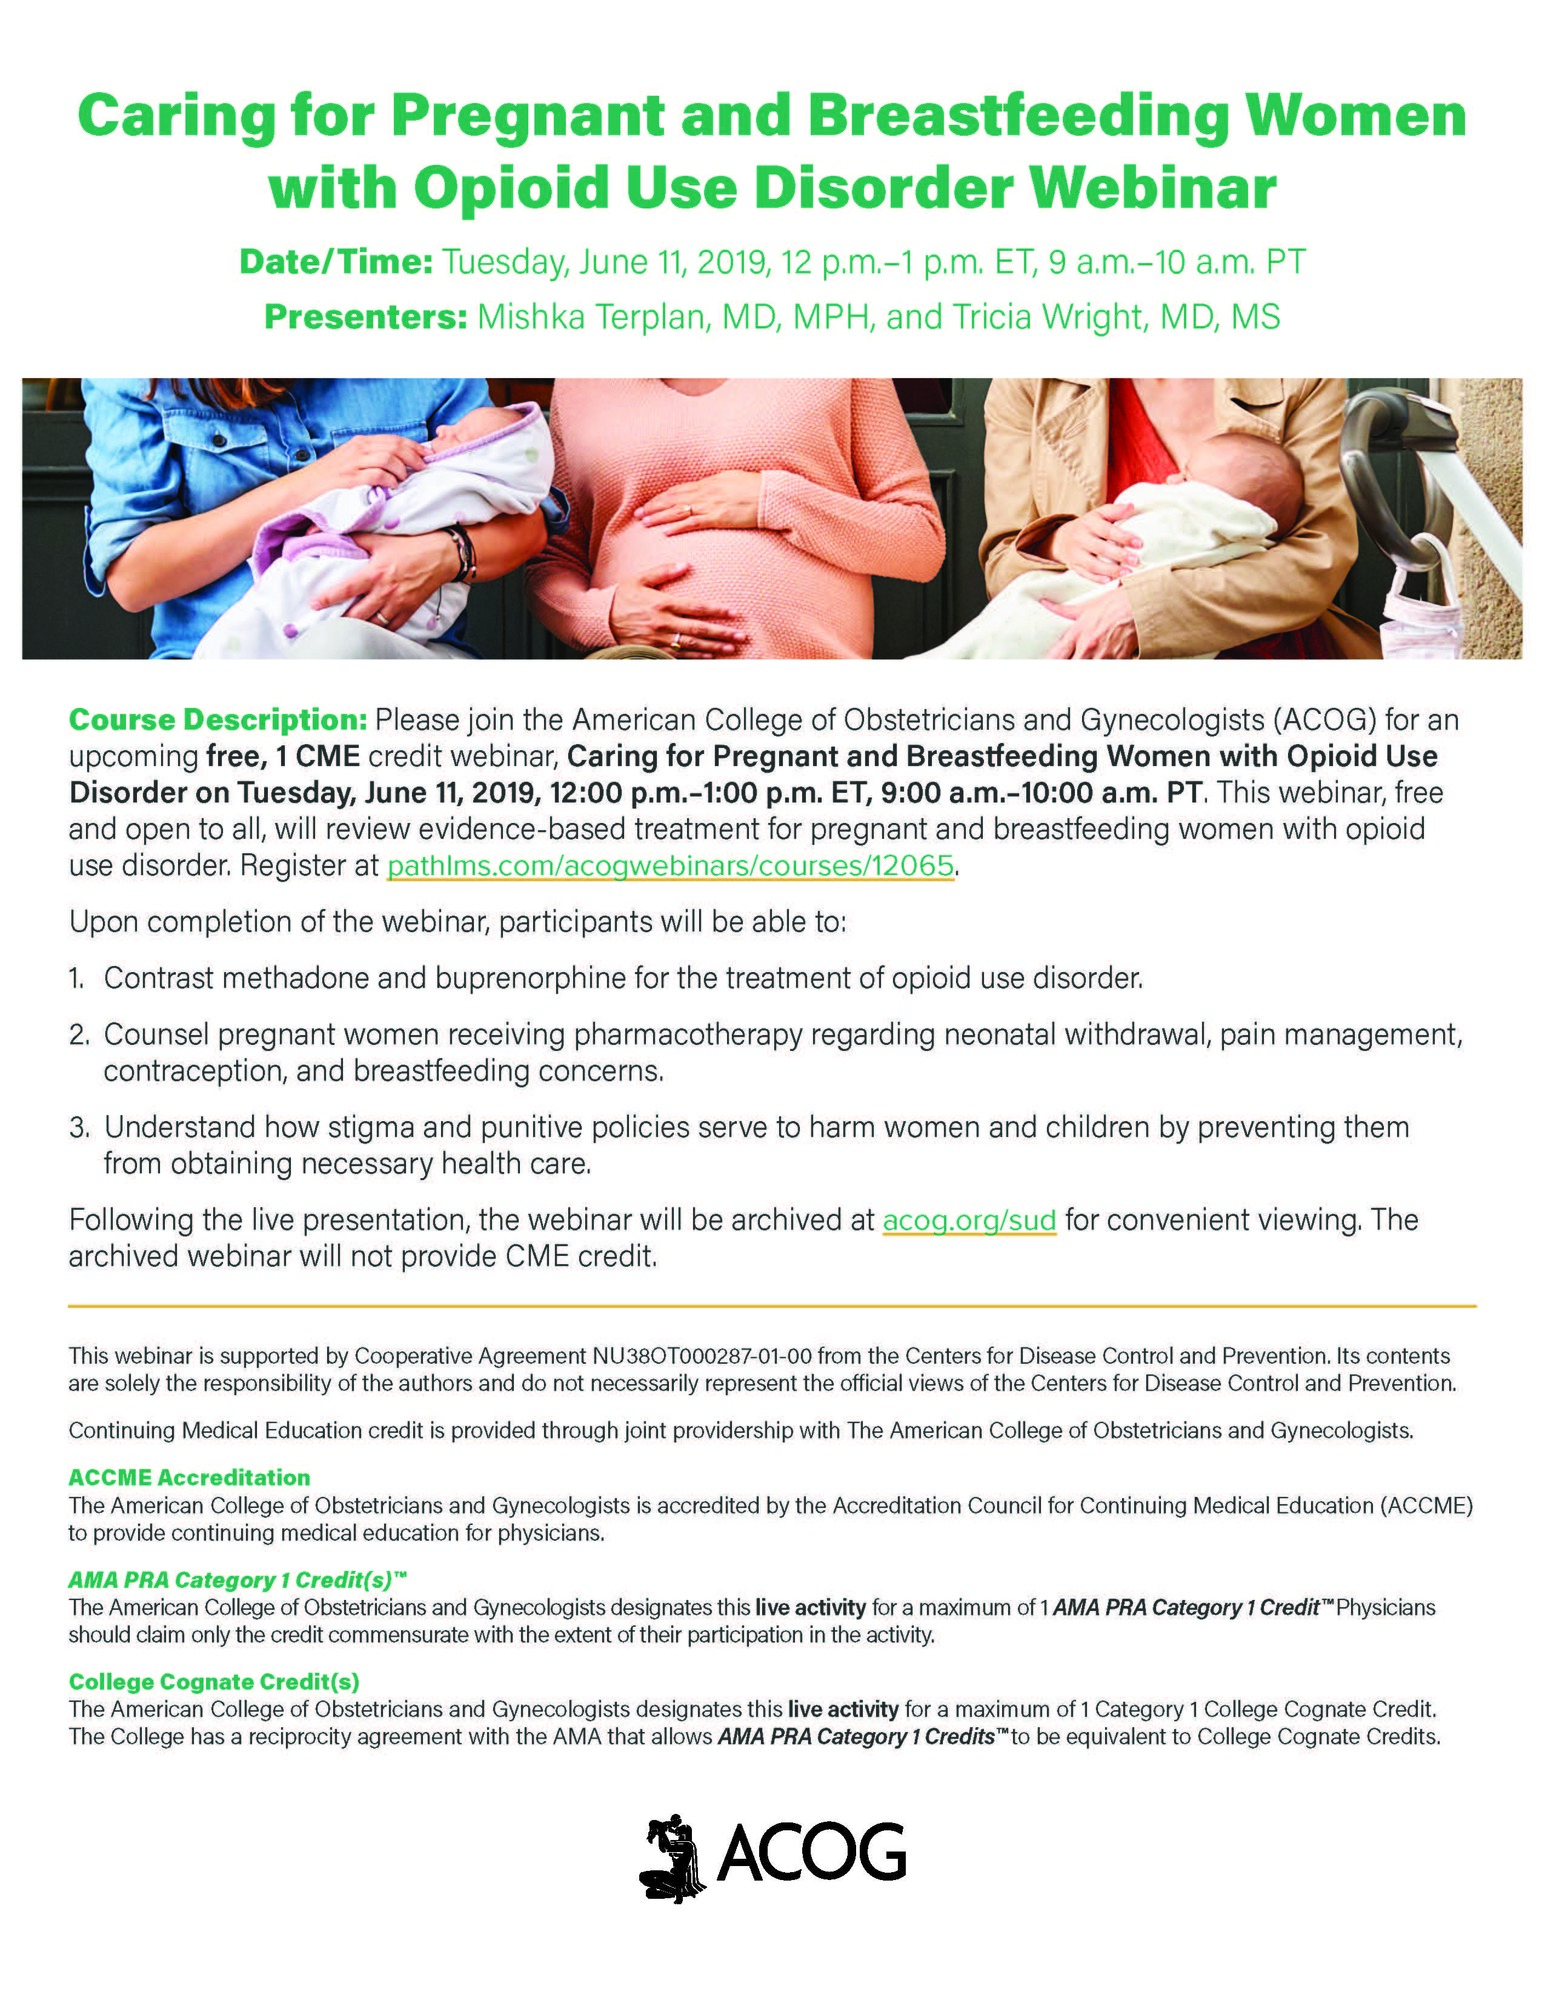 Opioid Use Disorder Webinar Flyer